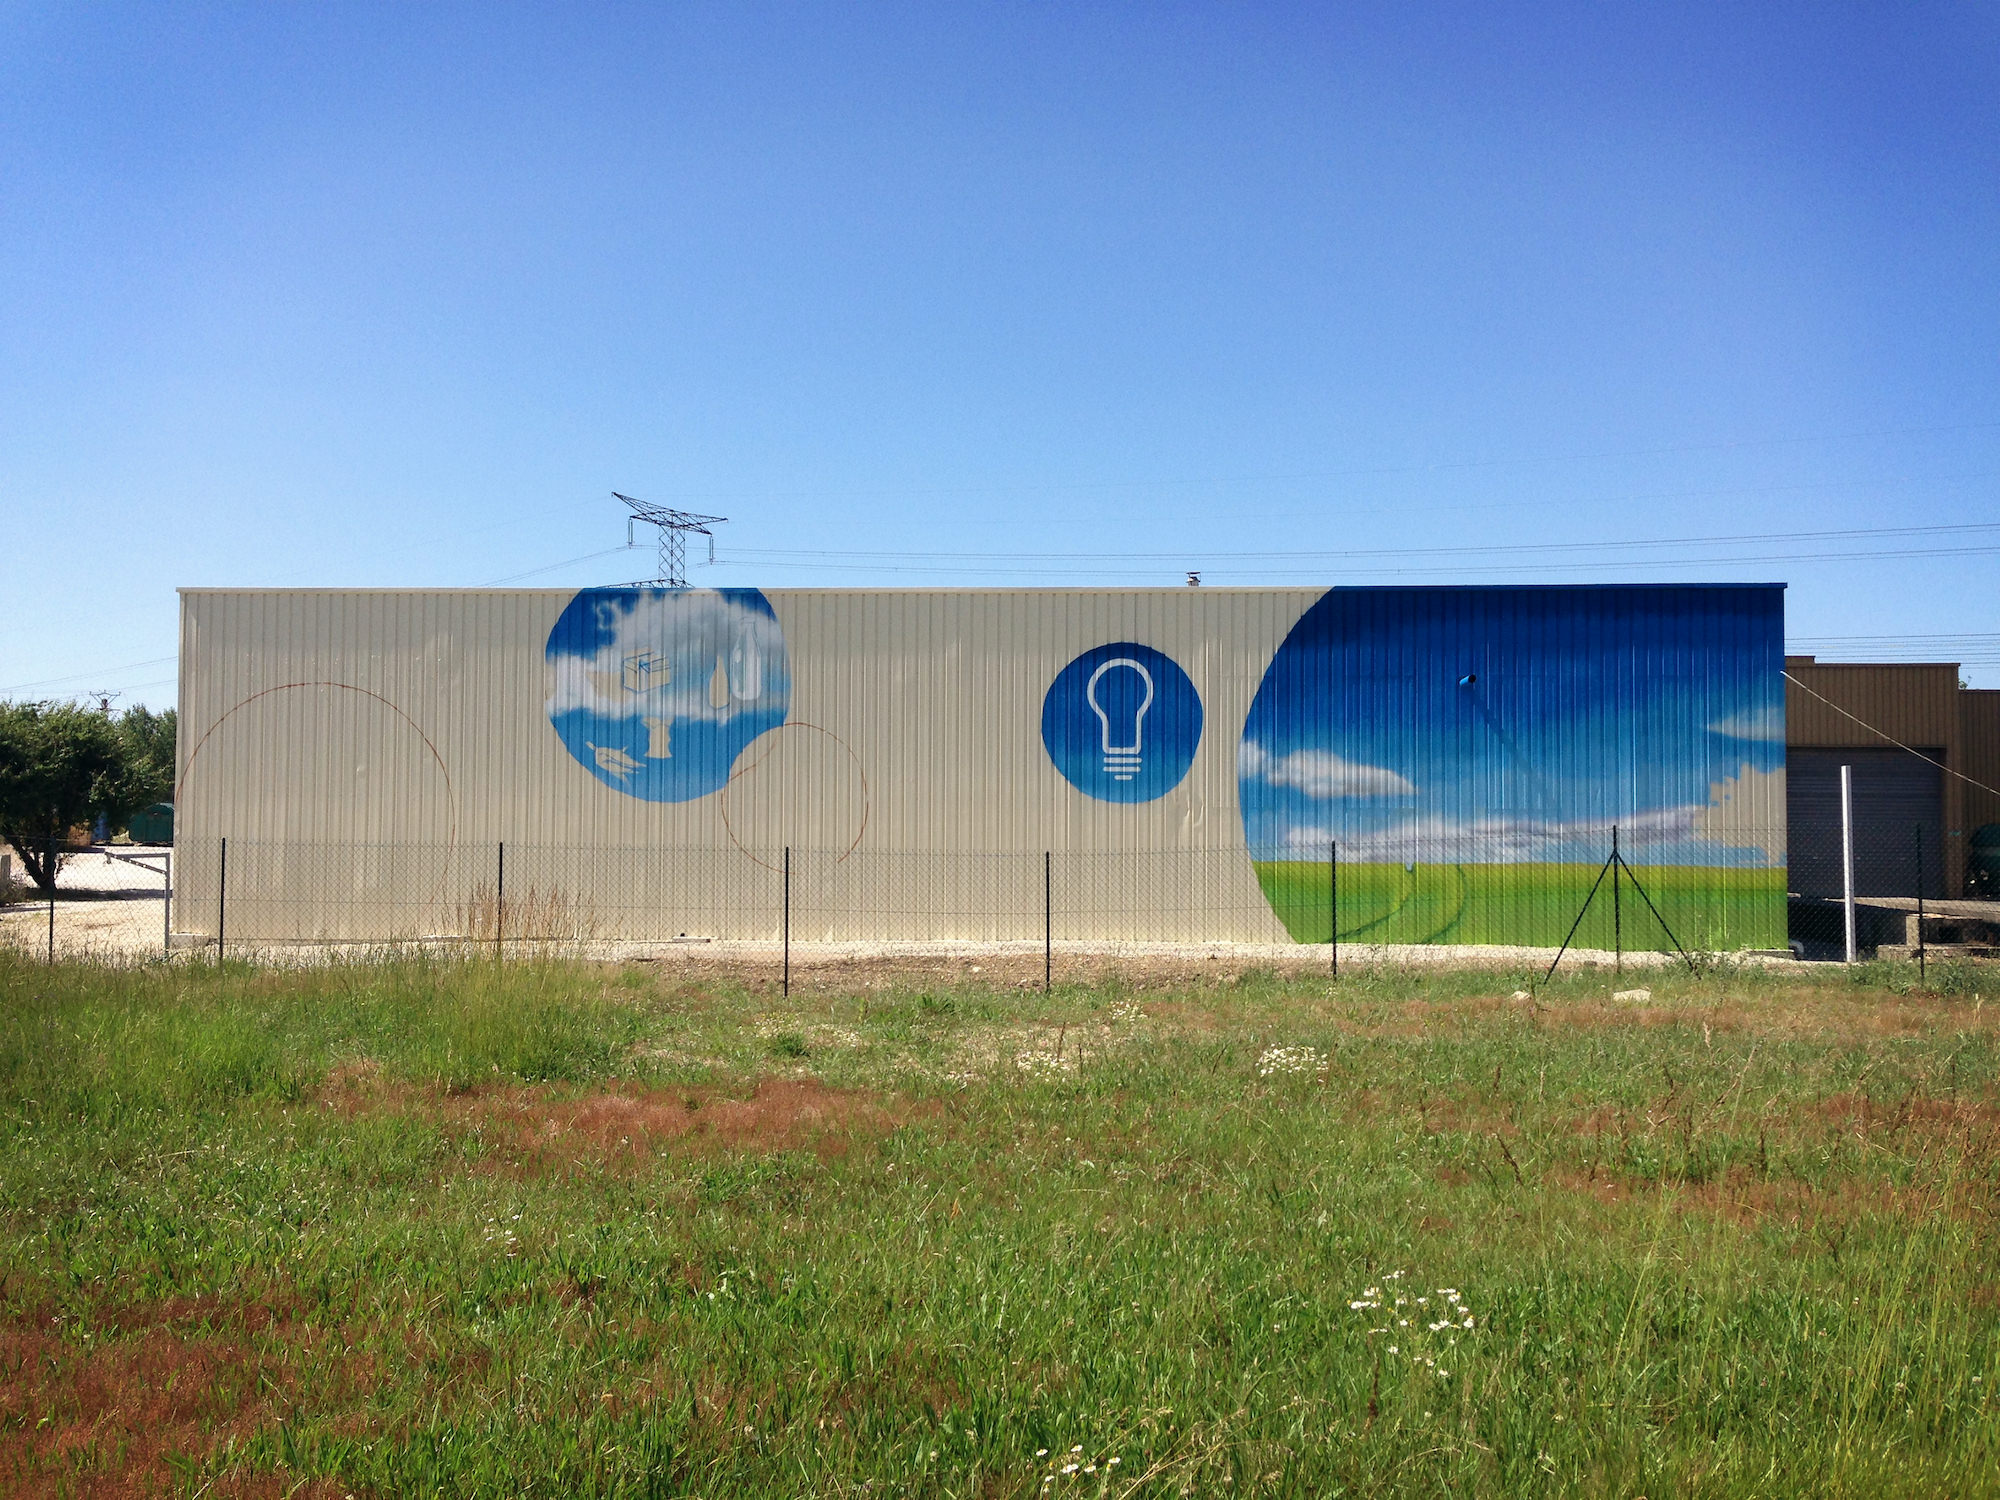 smivom auterive artiste graffeur toulouse halltimes